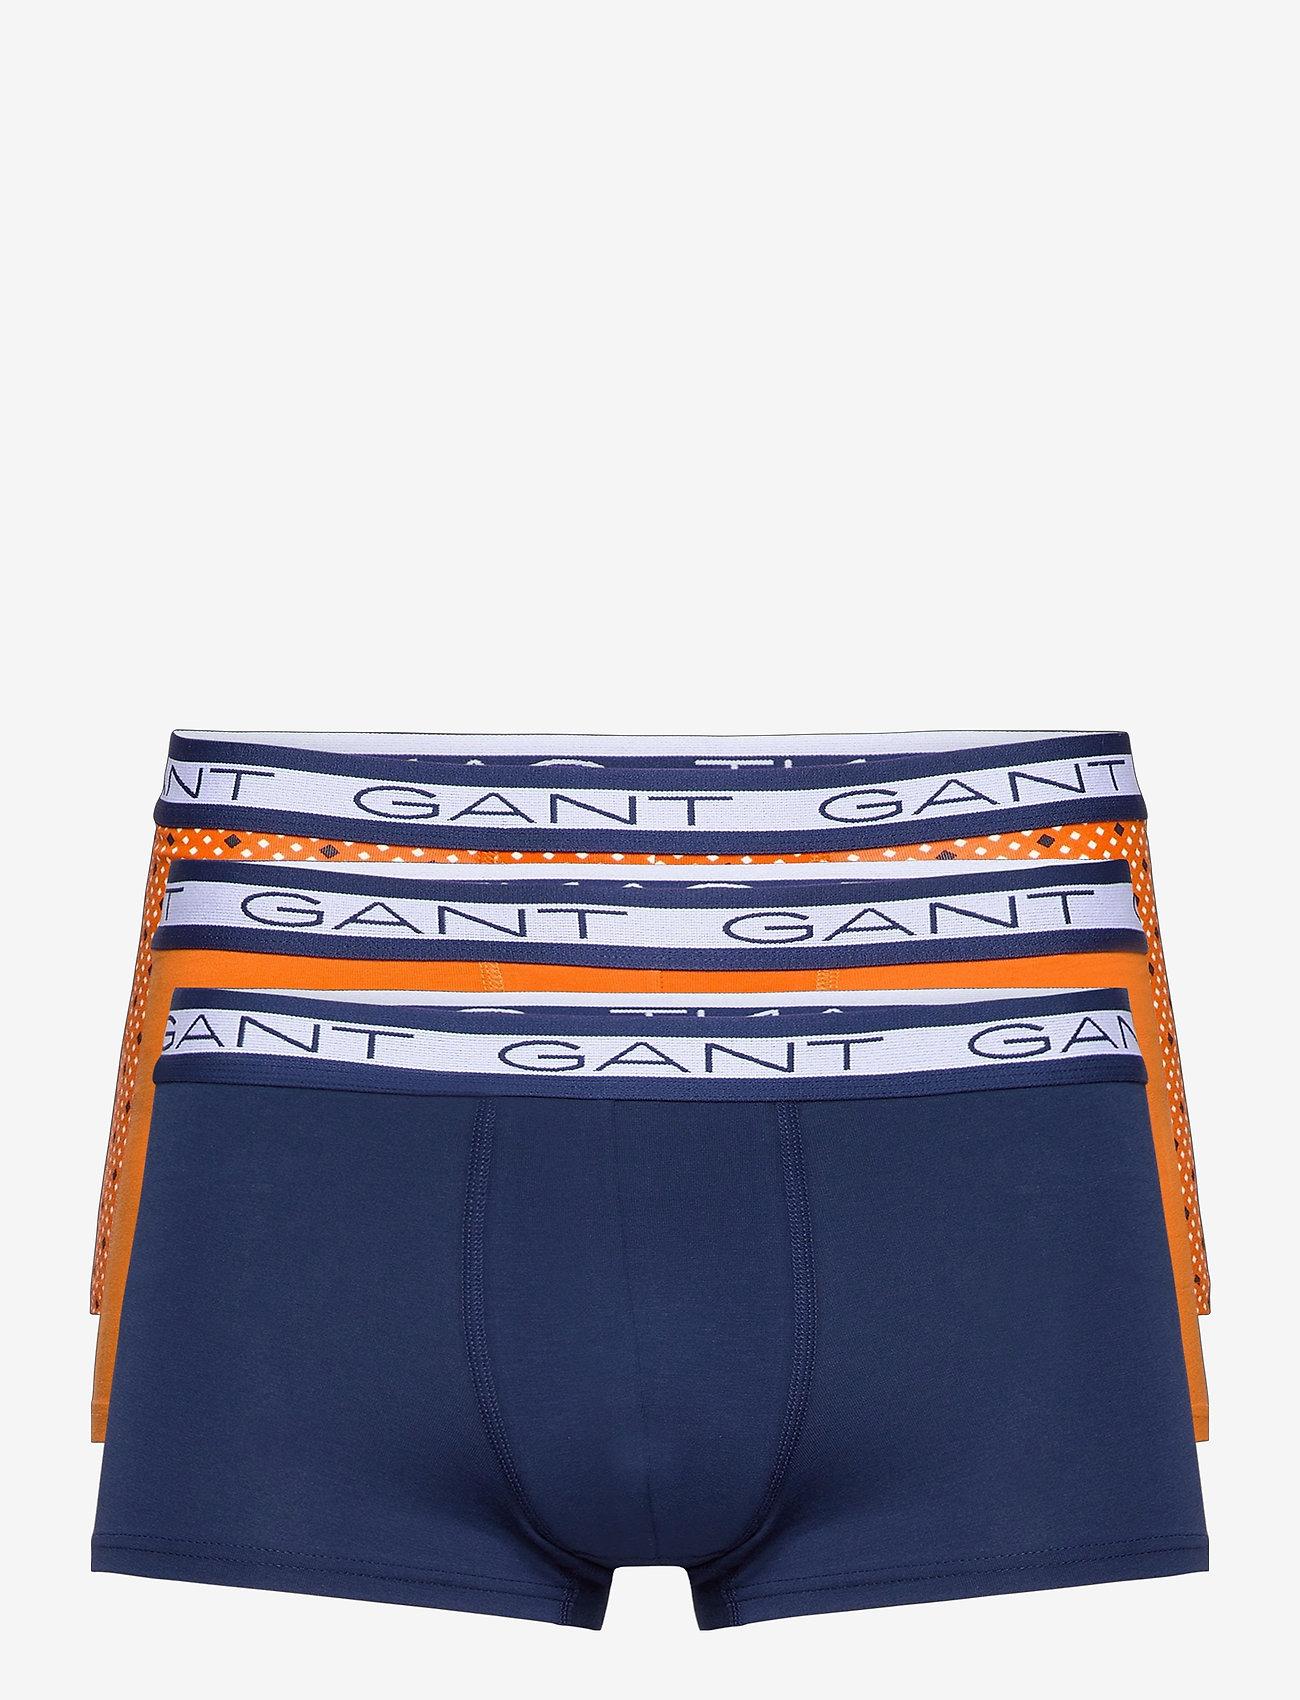 GANT - DIAMOND DOT BASIC TRUNK 3-PACK - boxers - russet orange - 0